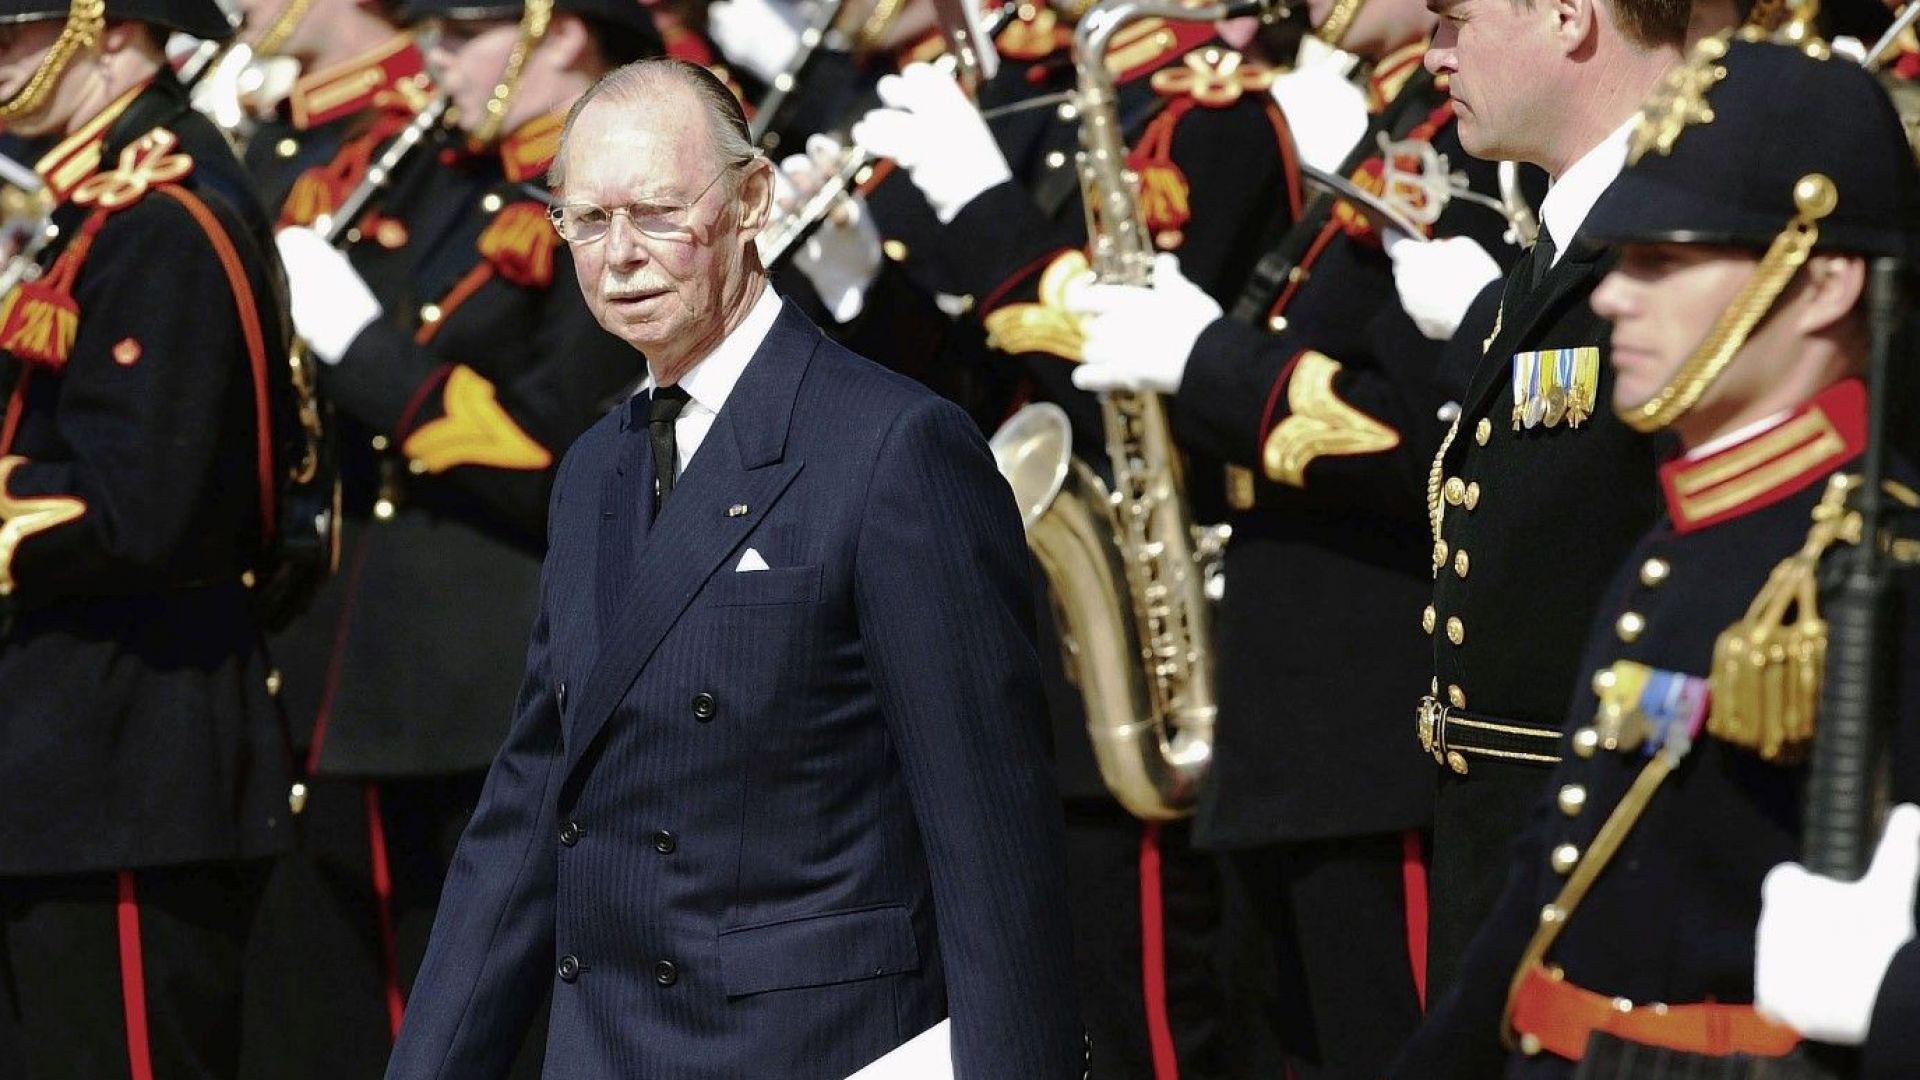 Великият херцог Жан Люксембургски почина на 98 години